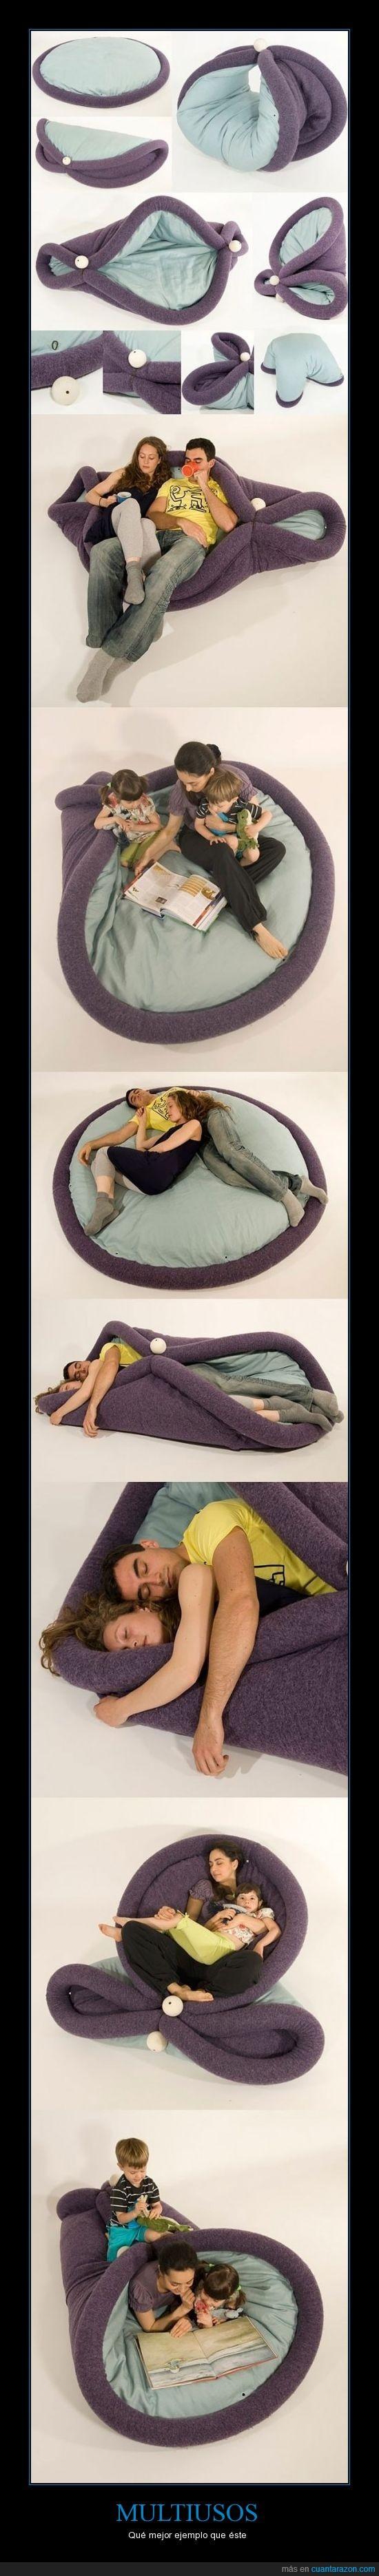 alfombra,cama,manta,multiusos